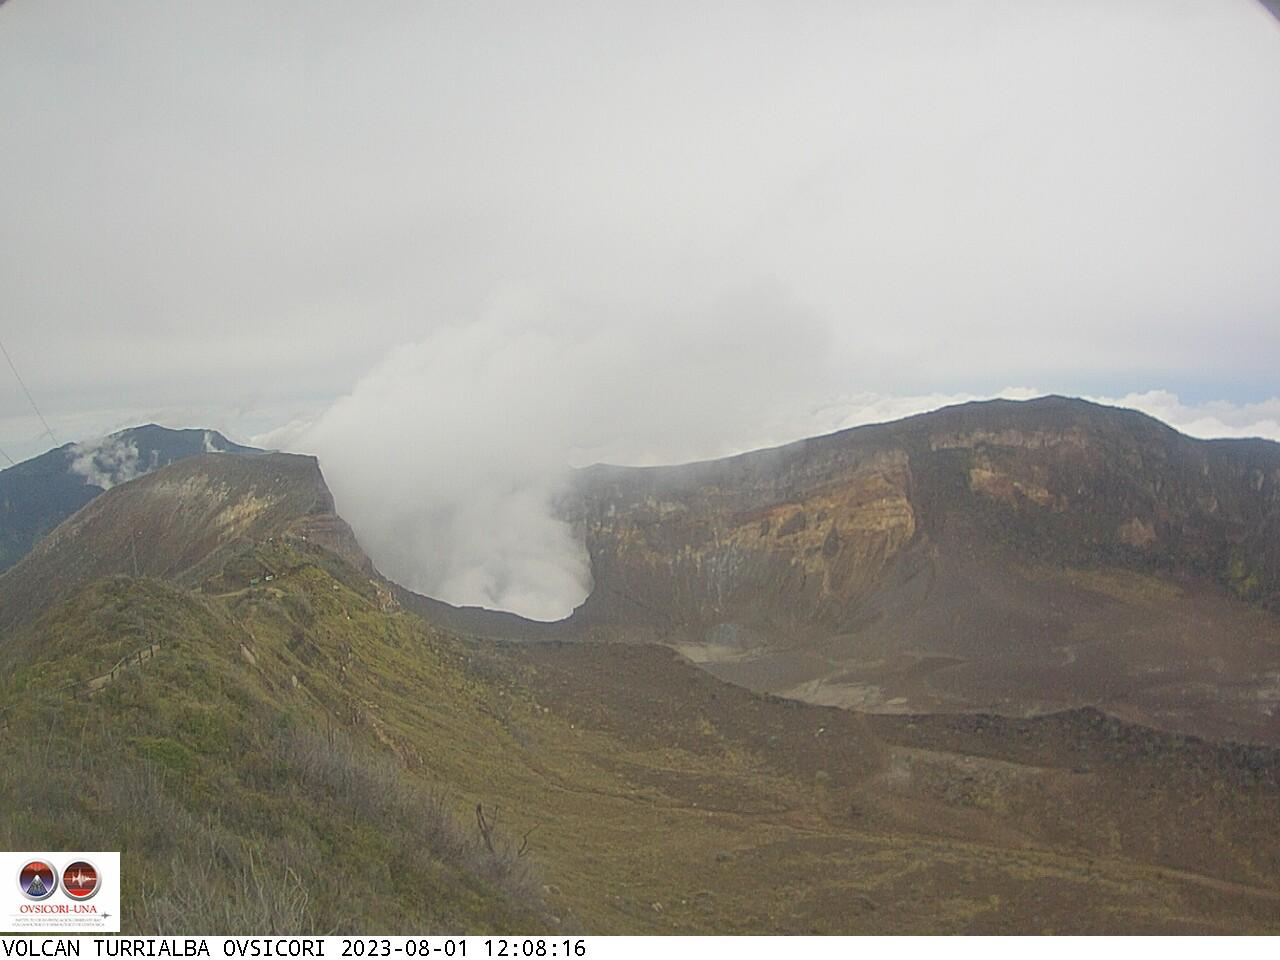 Volcano Turrialba Sun. 12:08